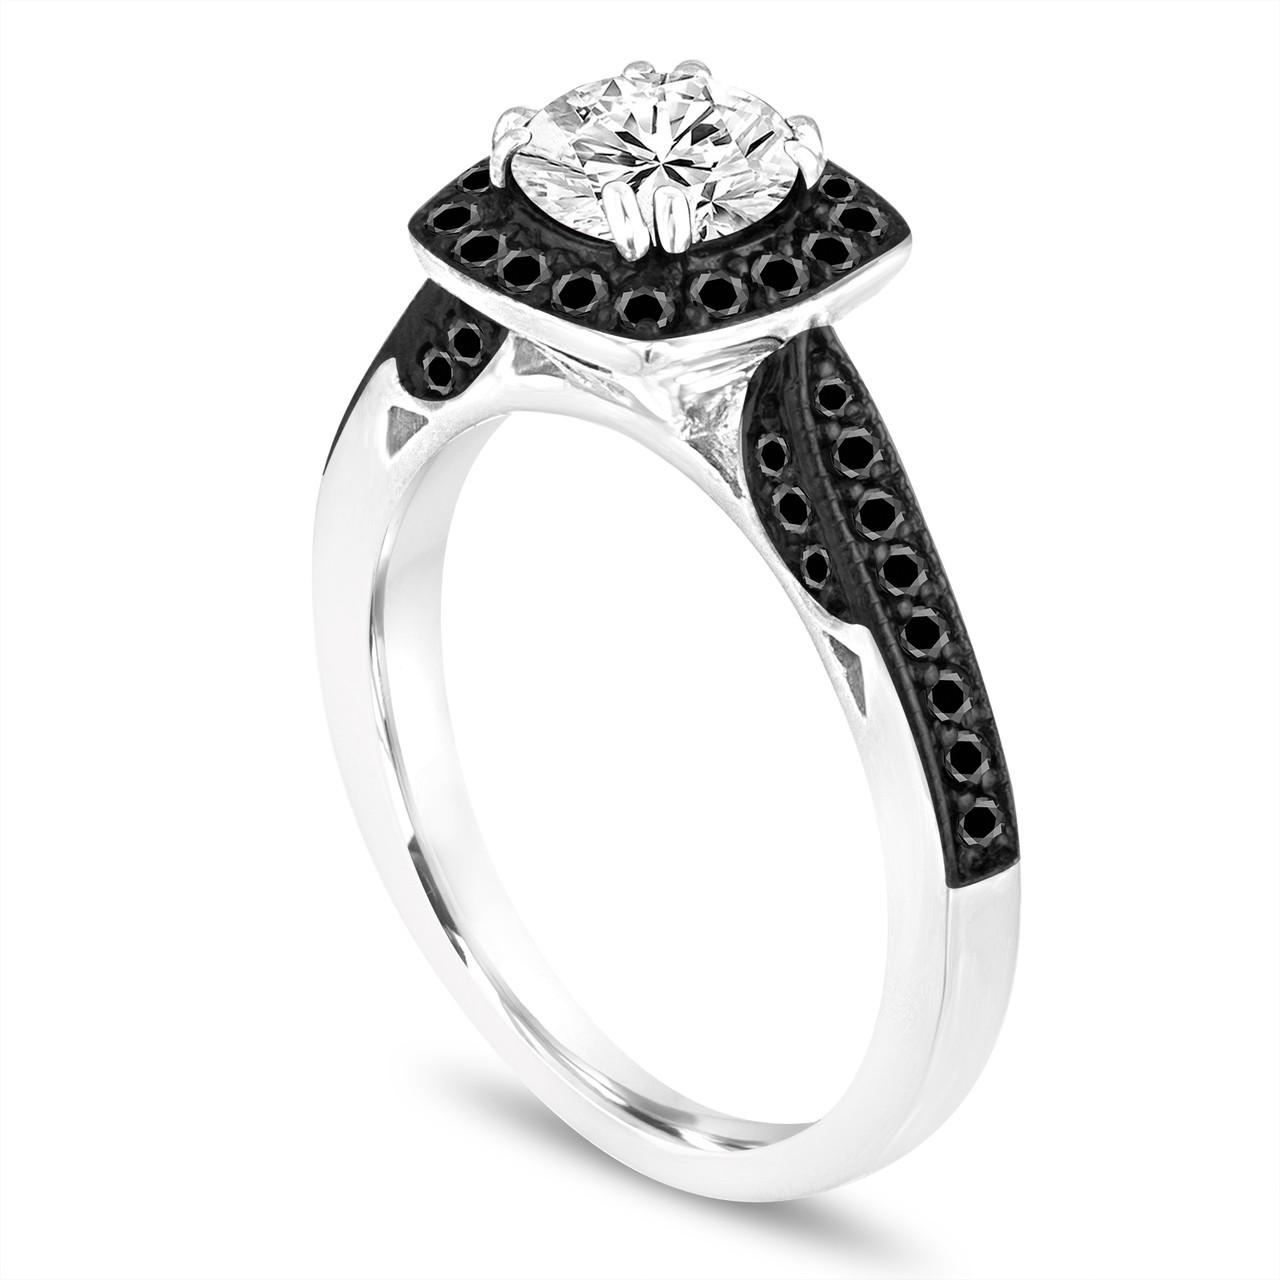 Gia Certified Diamond Engagement Ring Black Diamond